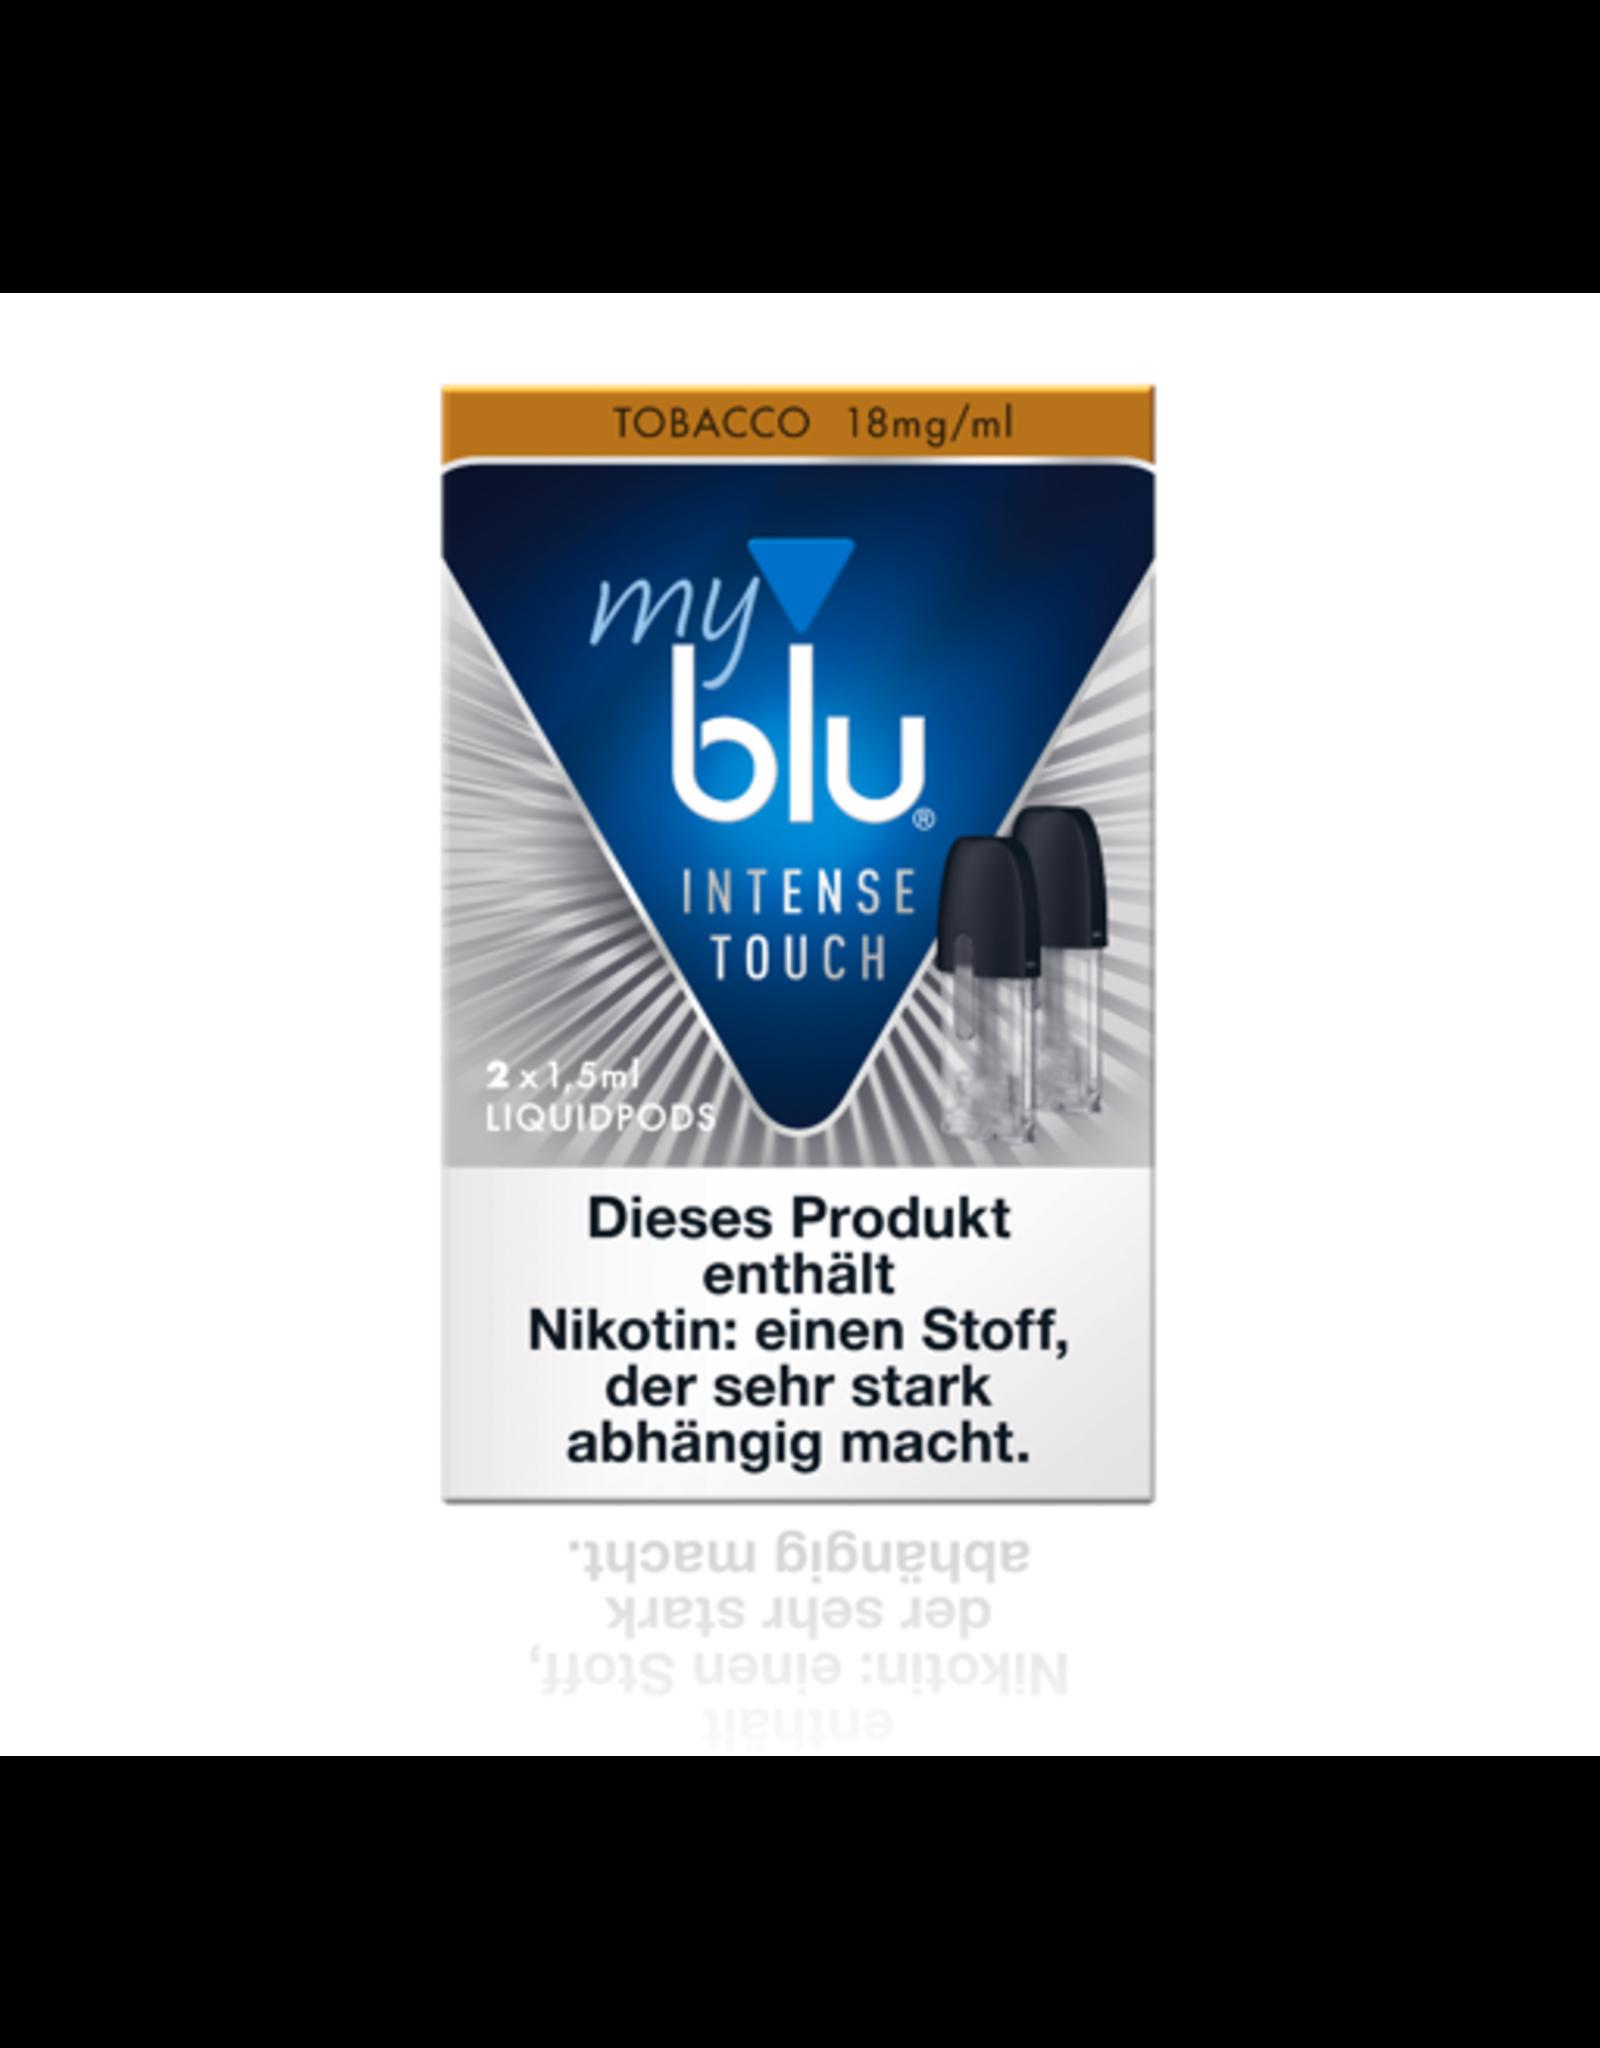 My Blu myblu INTENSE TOUCH TOBACCO 18mg/ml LIQUIDPOD